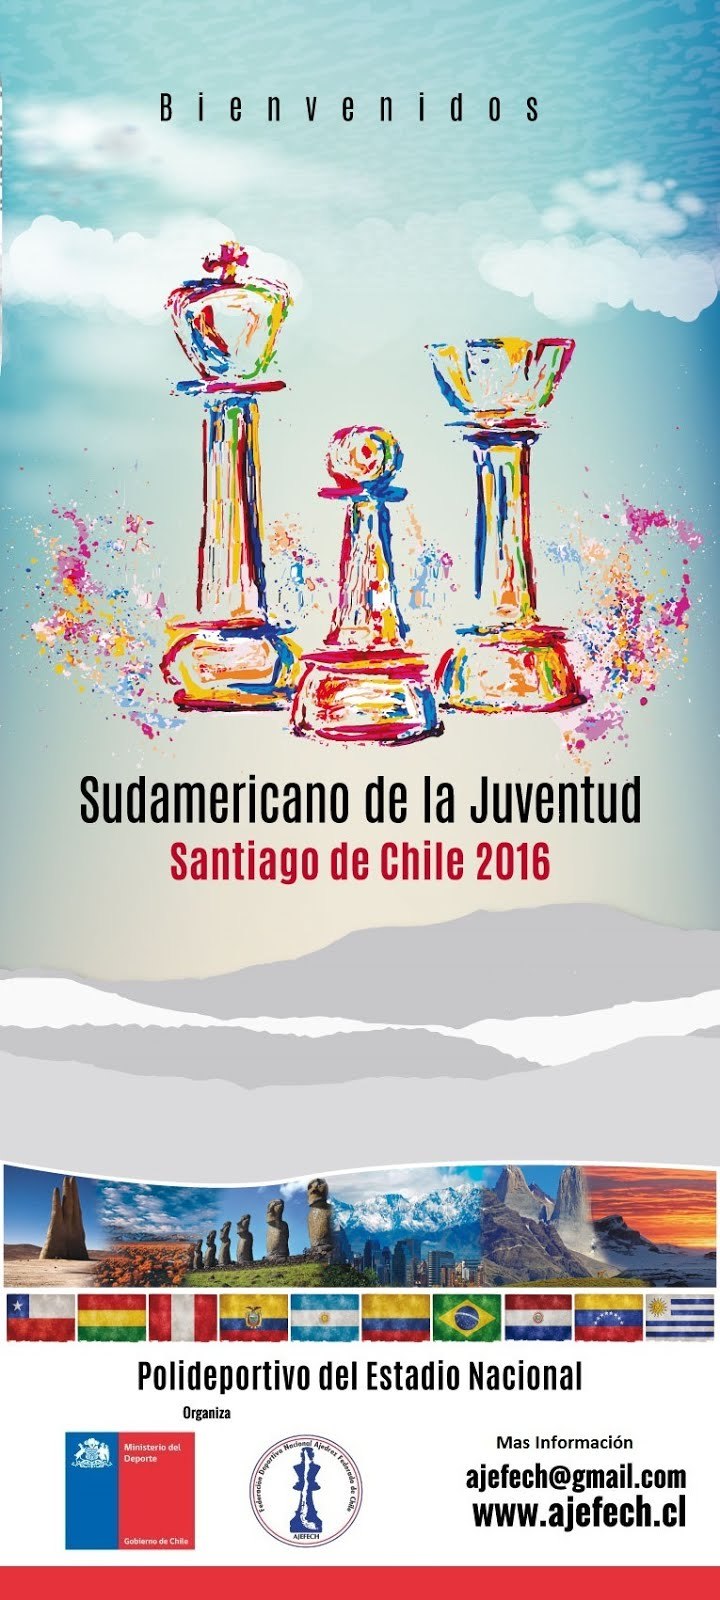 SANTIAGO CHILE 2016